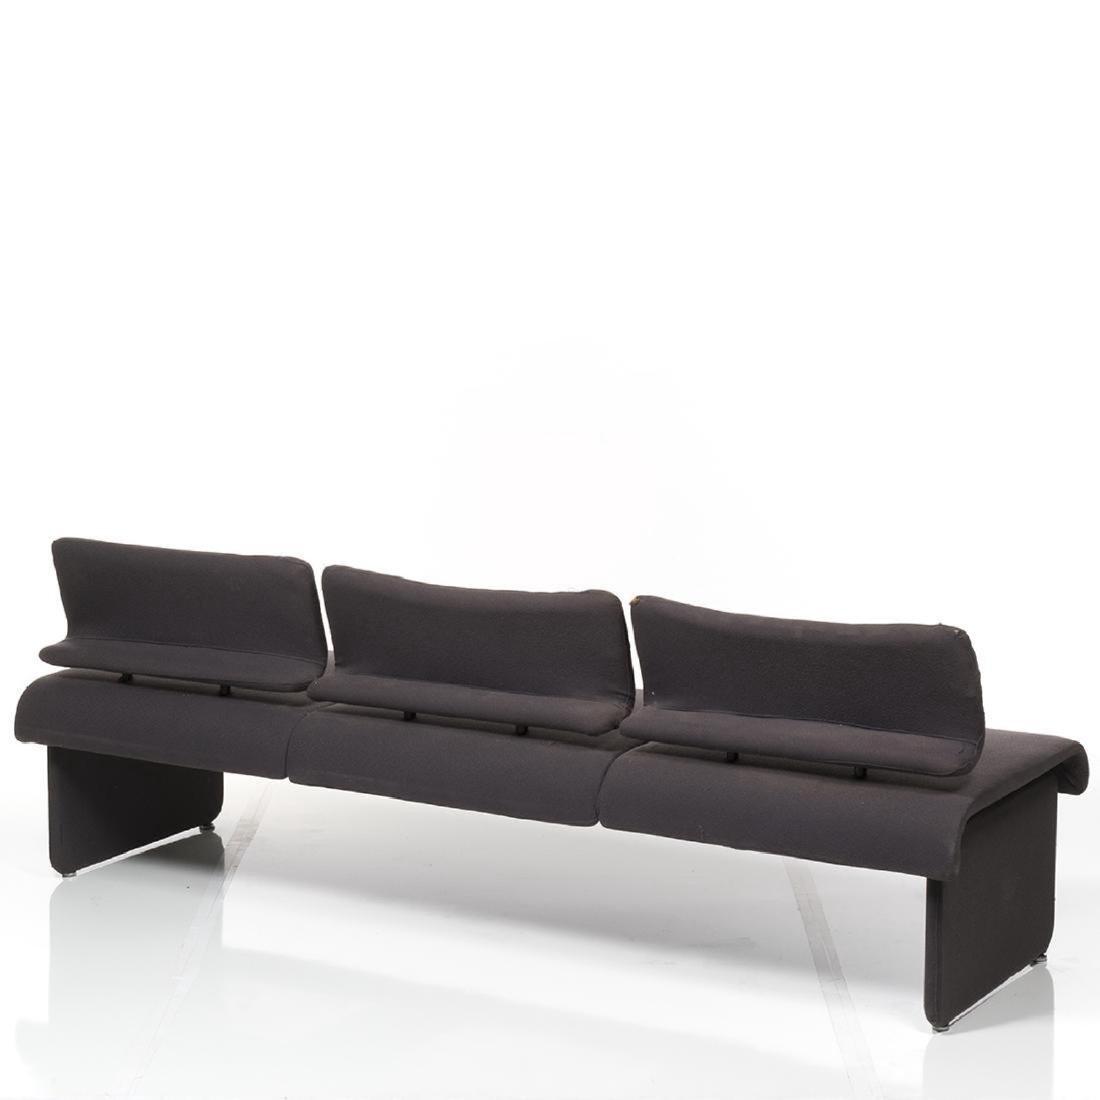 Harvey Probber Sofa - 3